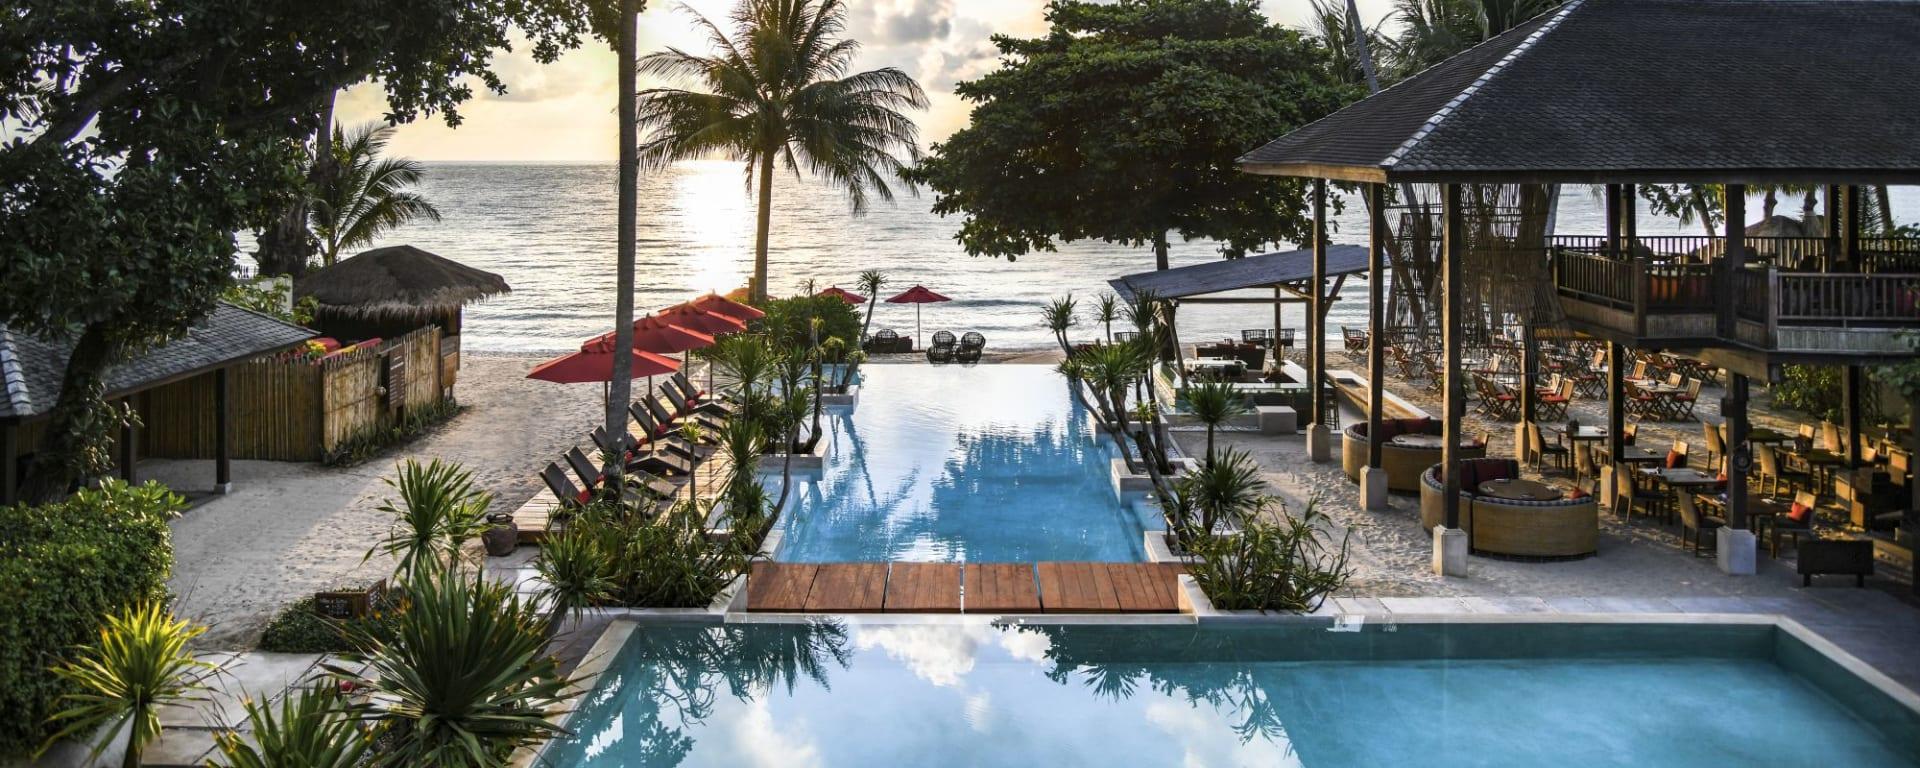 Anantara Rasananda Koh Phangan Villas in Ko Phangan: Pool View in the evening